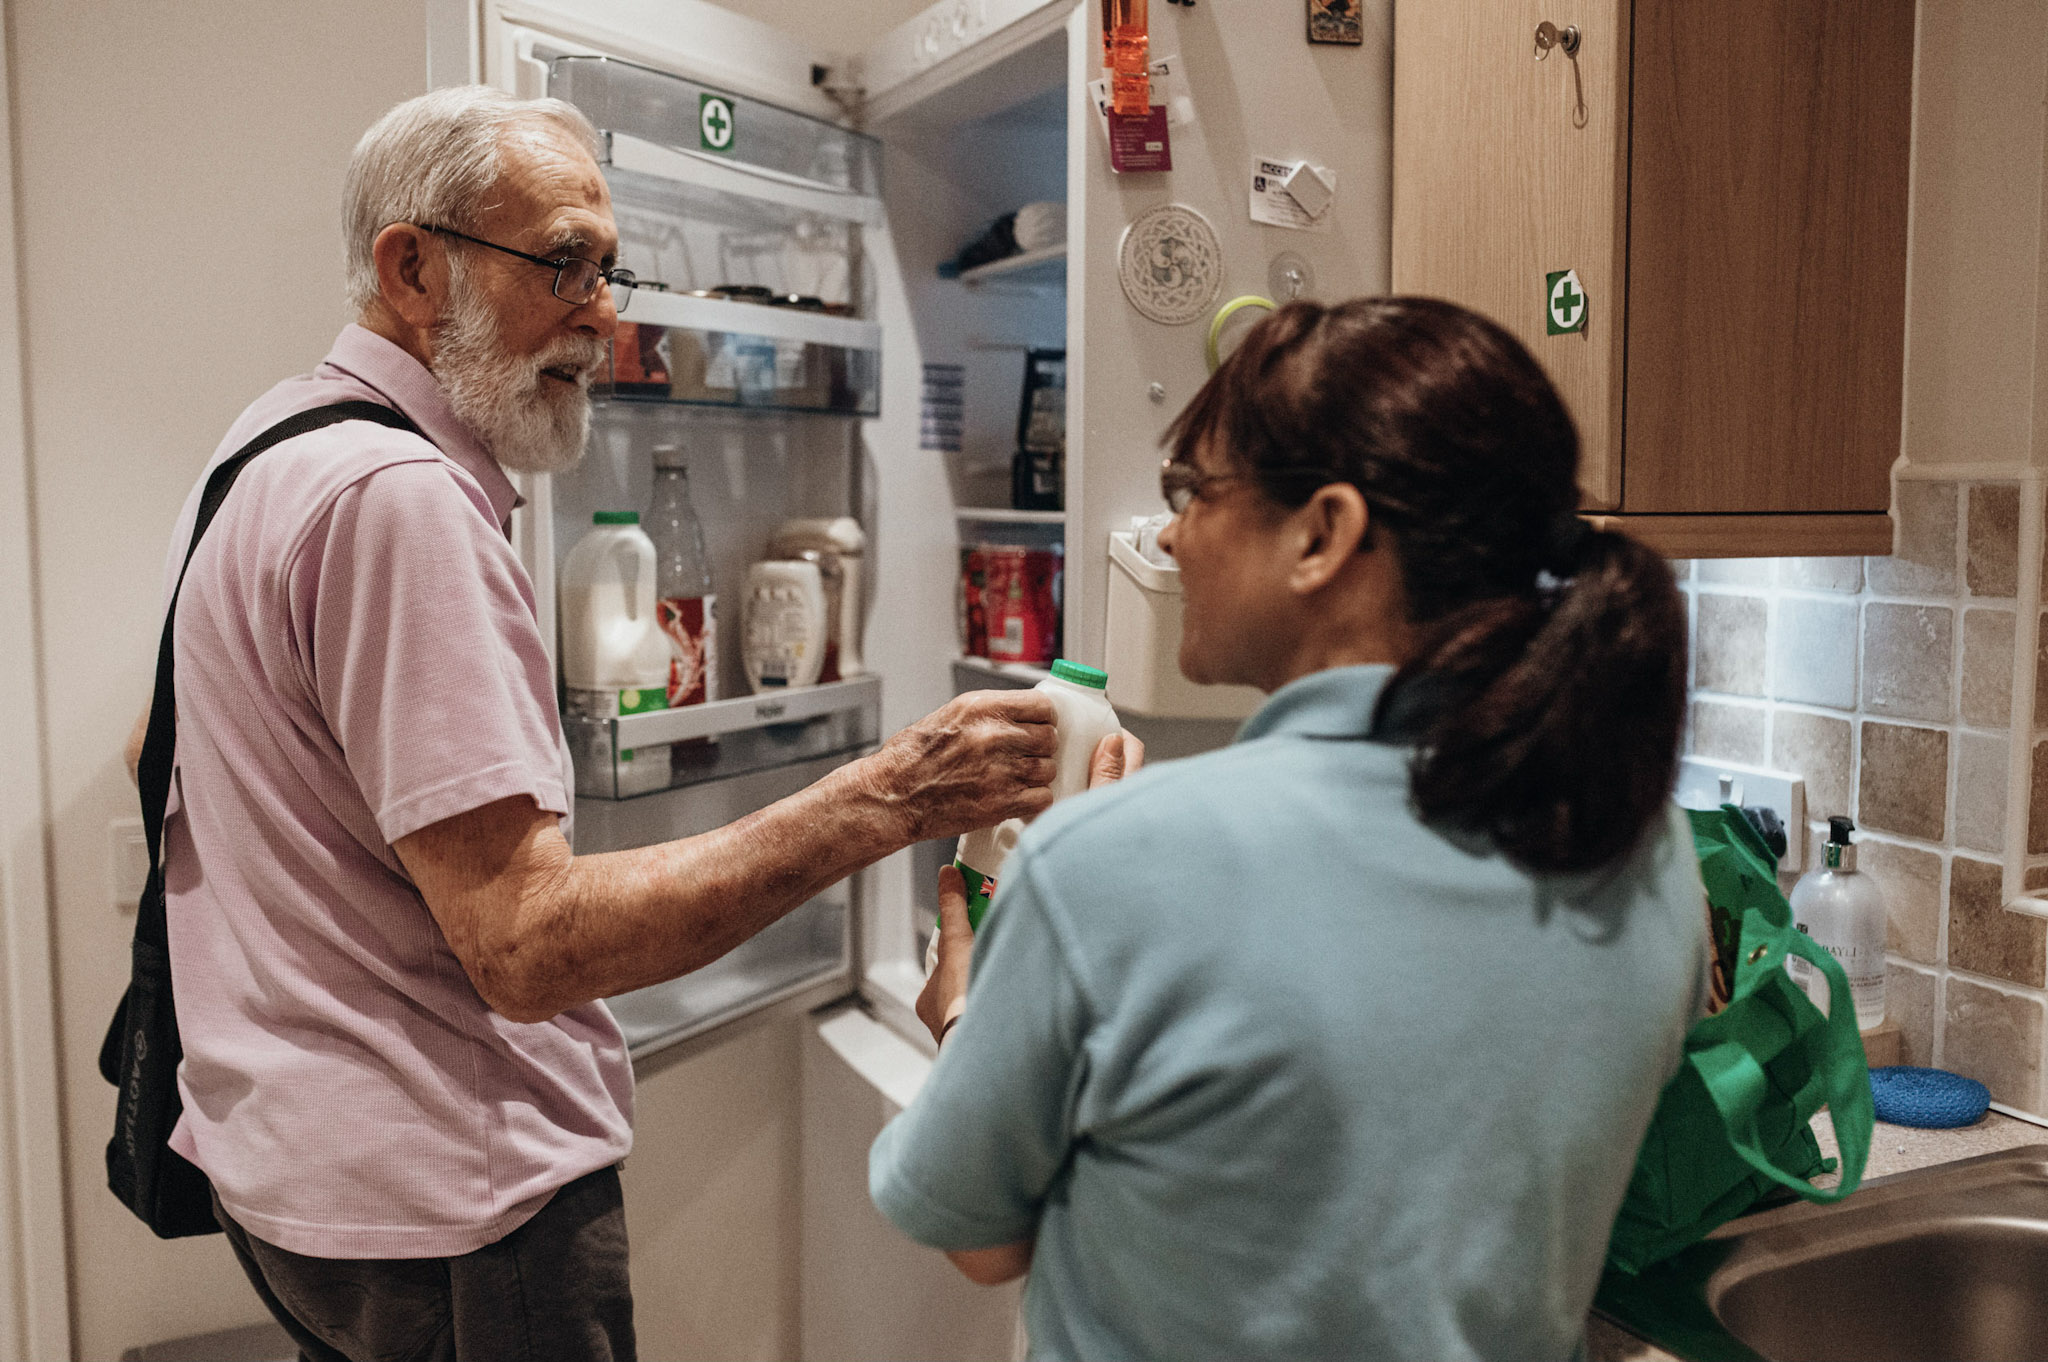 Radis Community Care announces new services in Cardiff